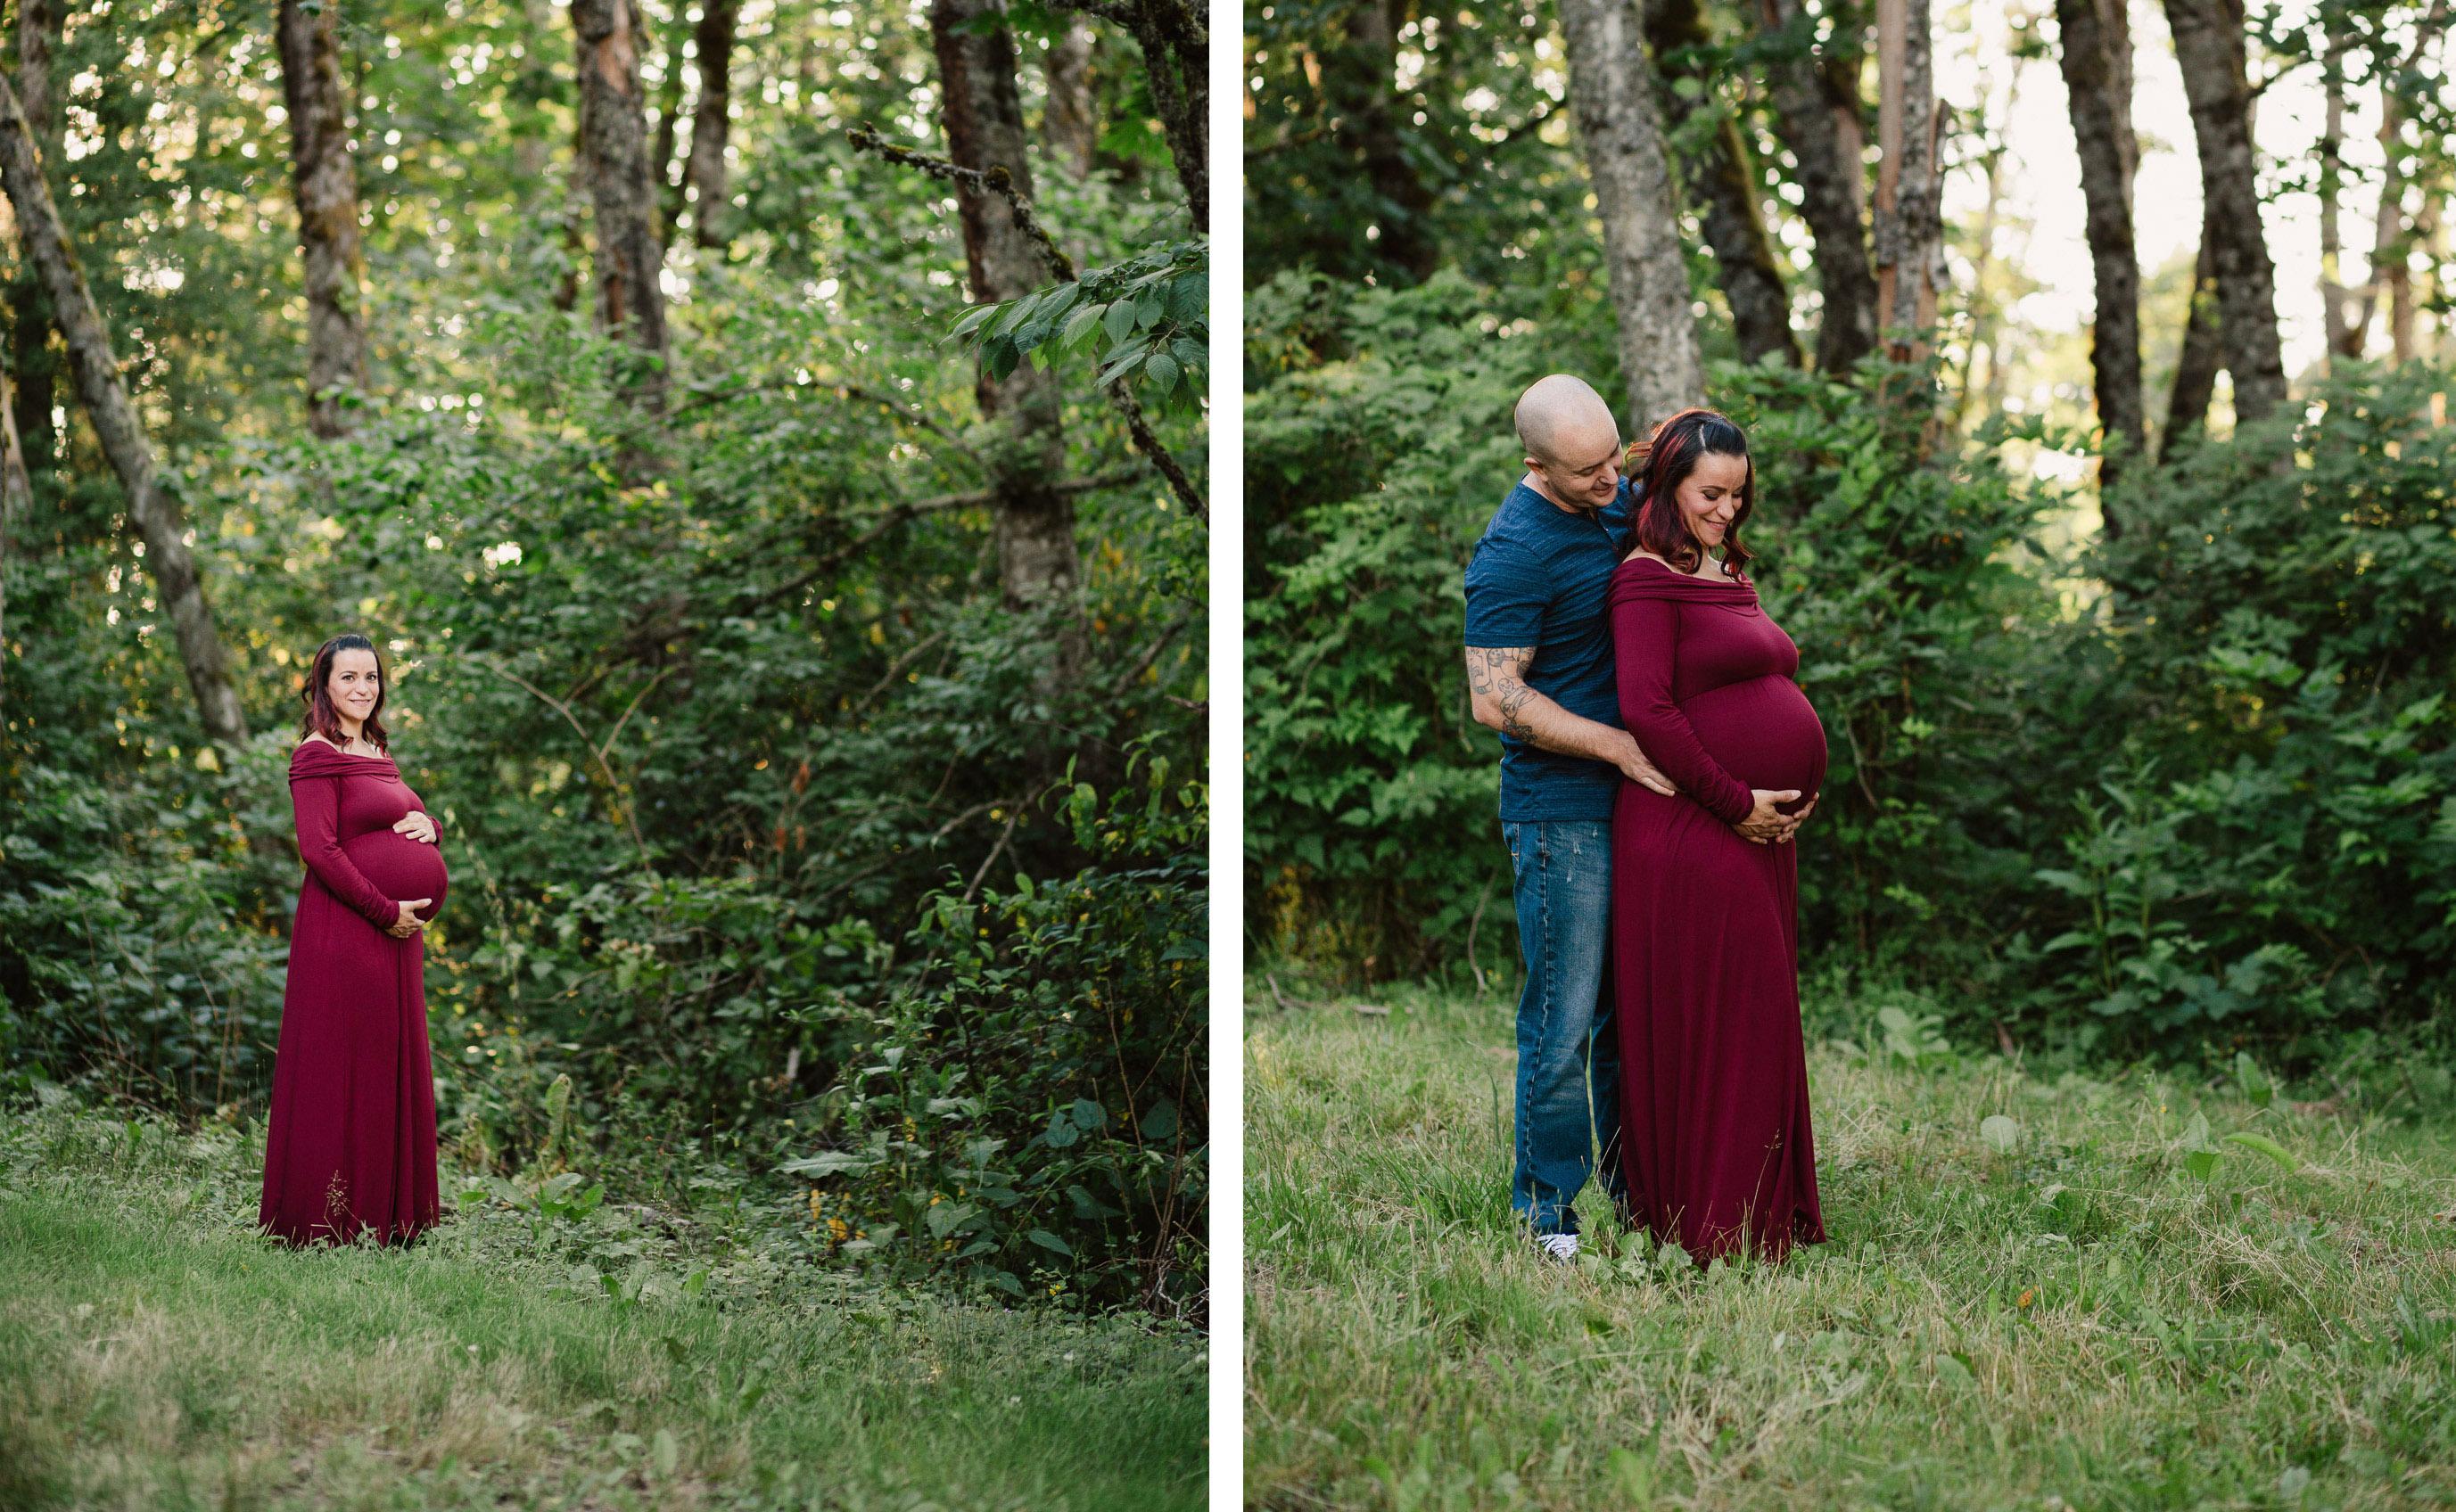 Gresham Maternity Photographer